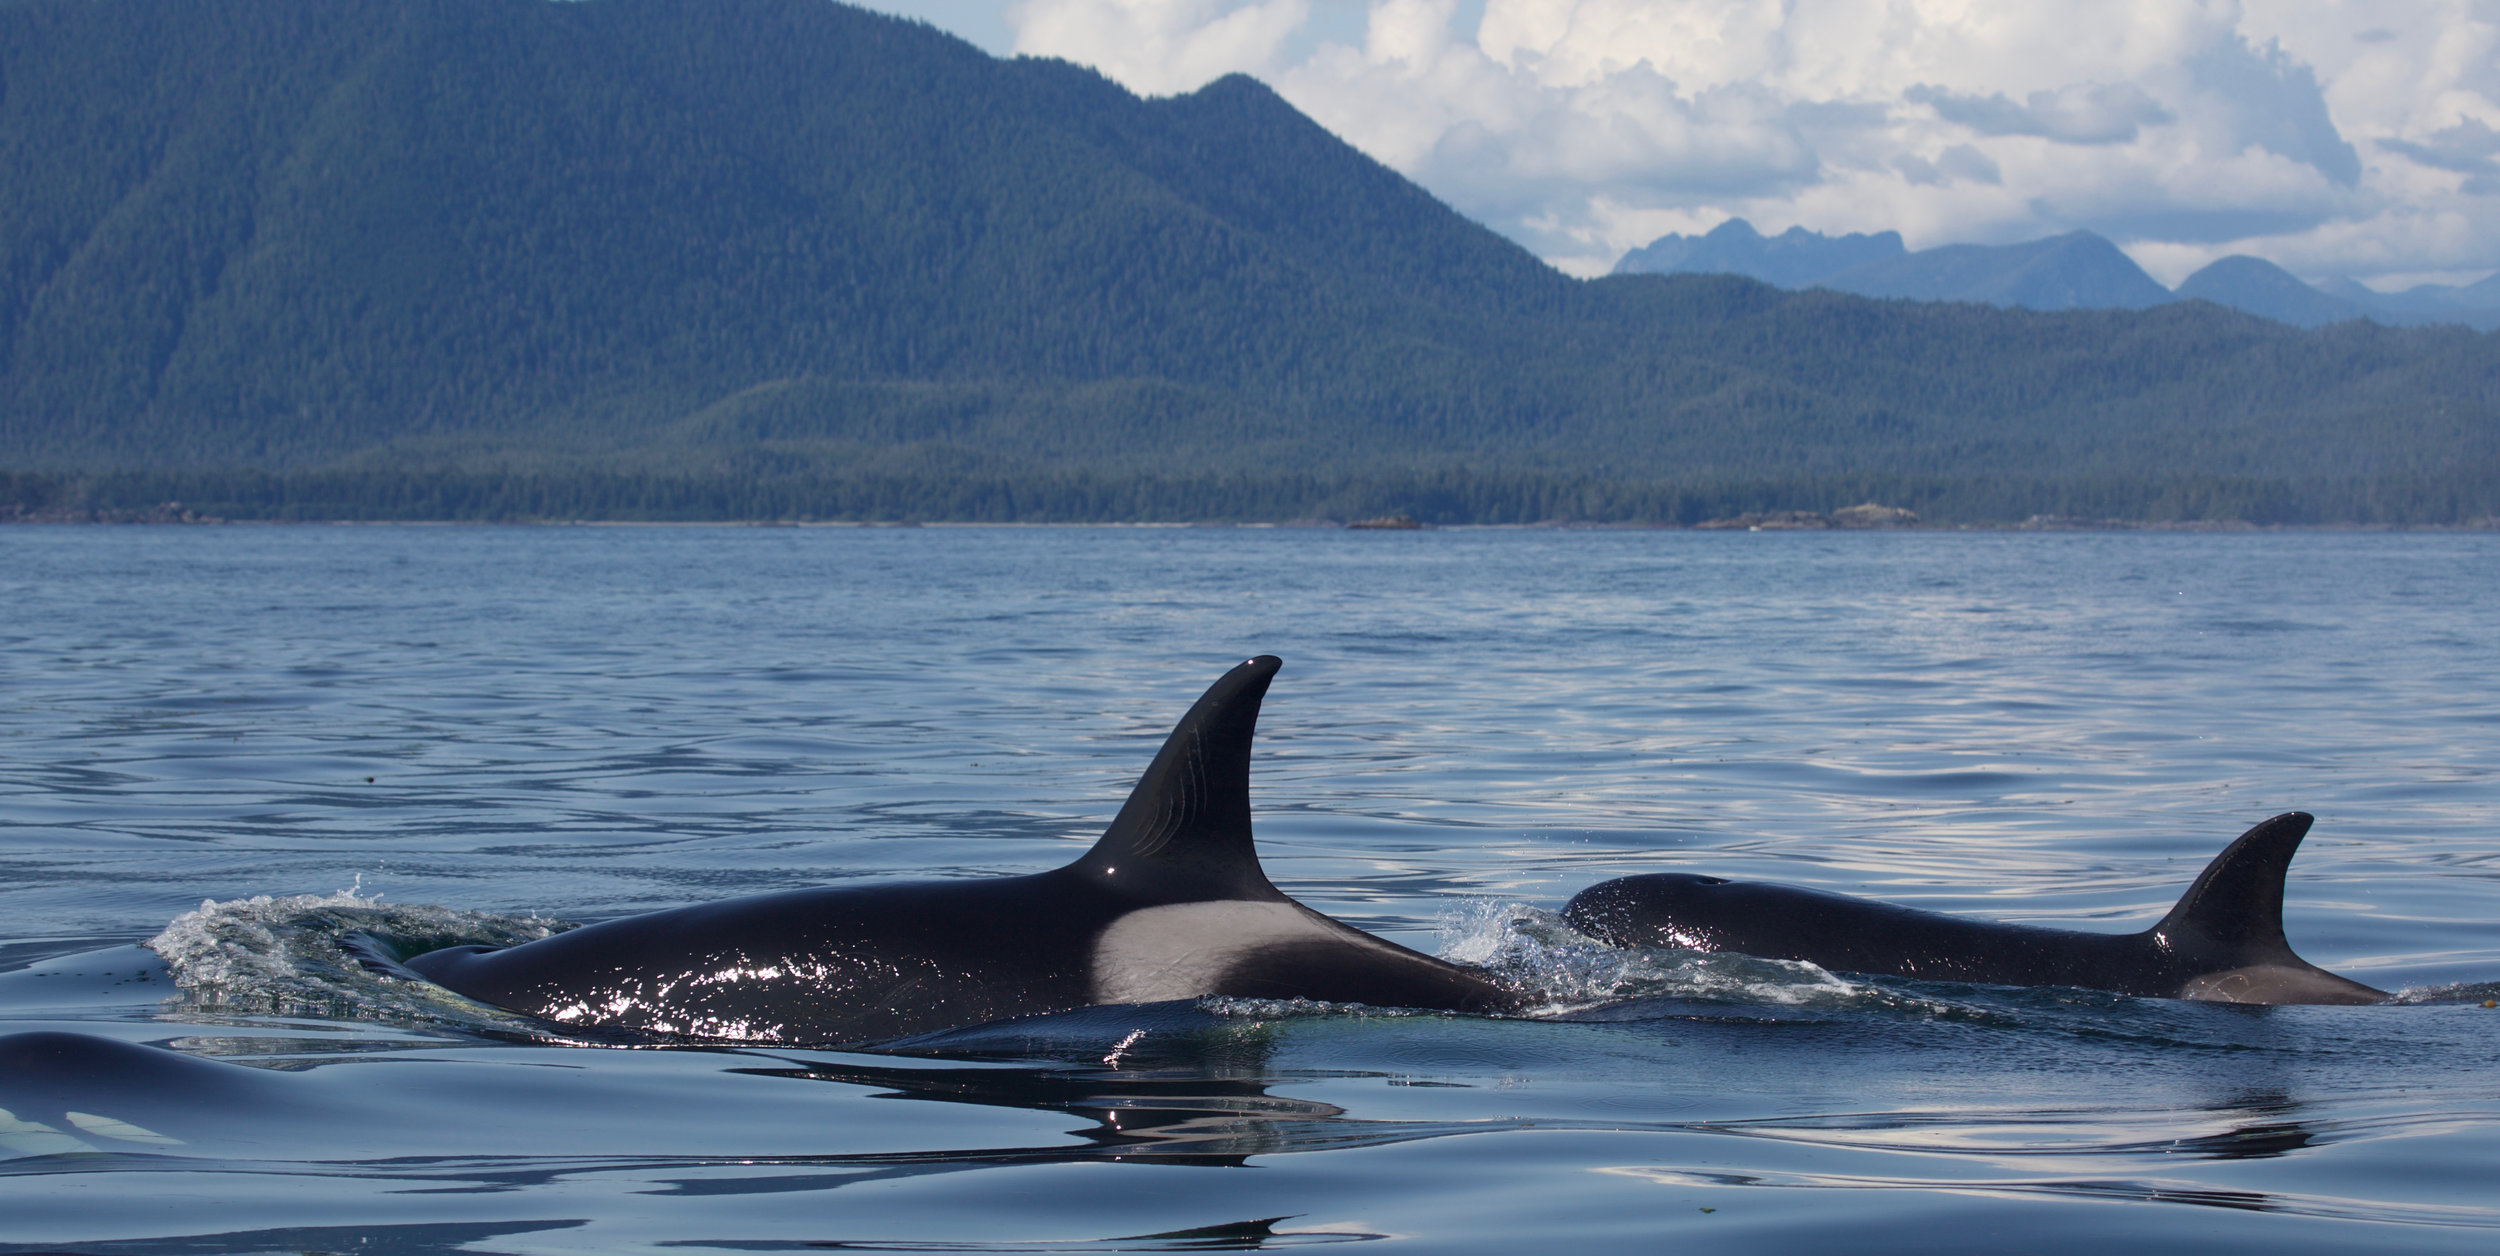 Whale Watching Tour, Tofino